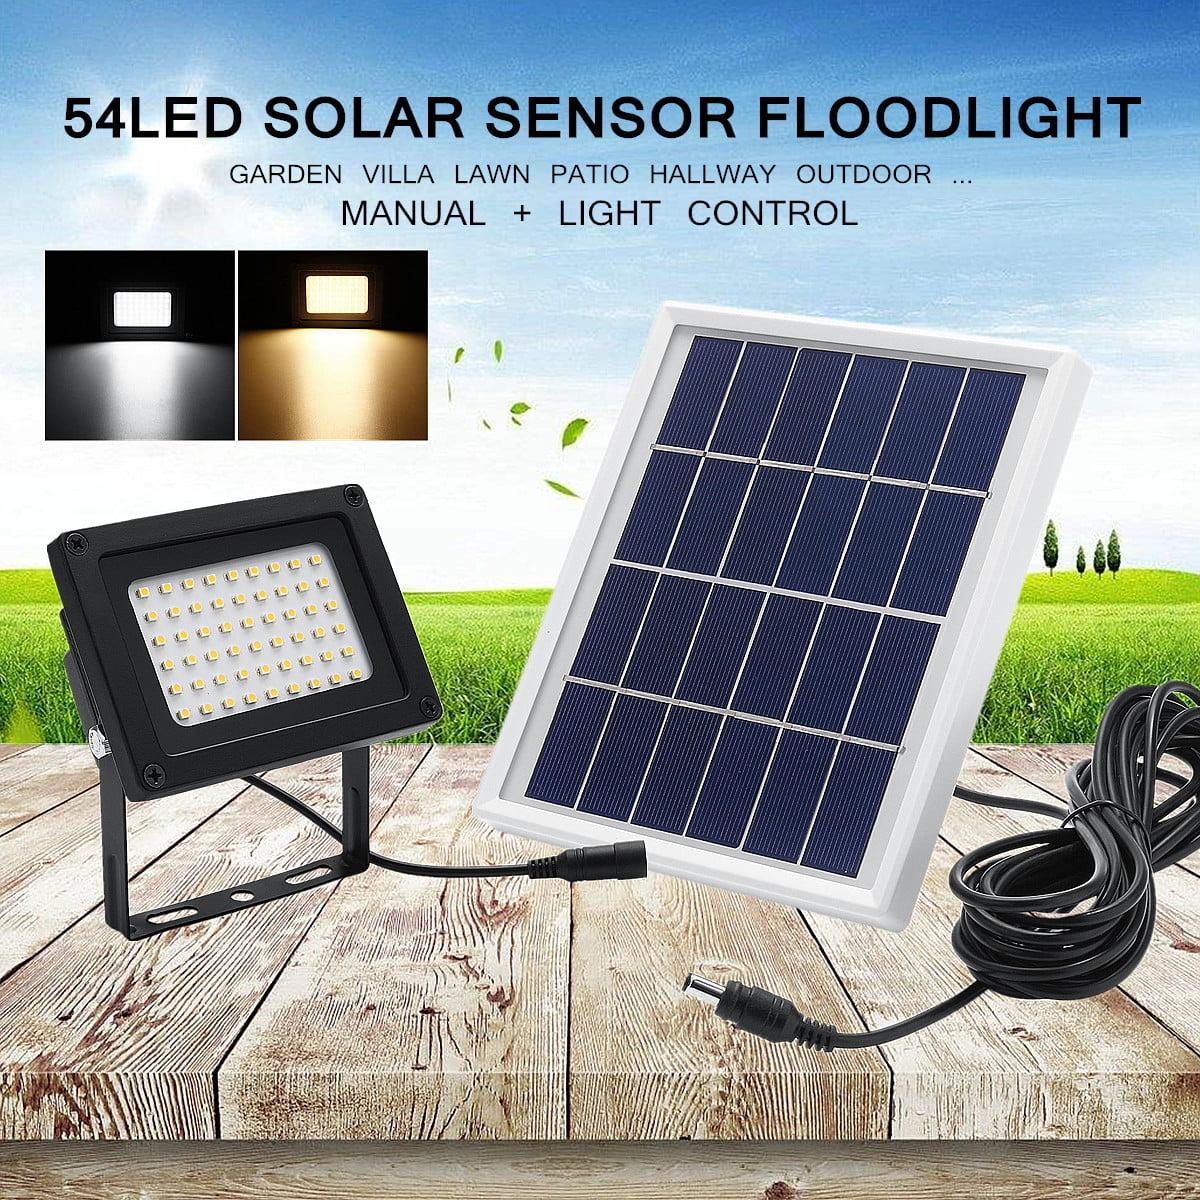 54  LED Wall Light Super Bright Solar Powered Lamp Flood Light Spot Lamp Dusk-to-Dawn Sensor Waterproof + Solar Panel